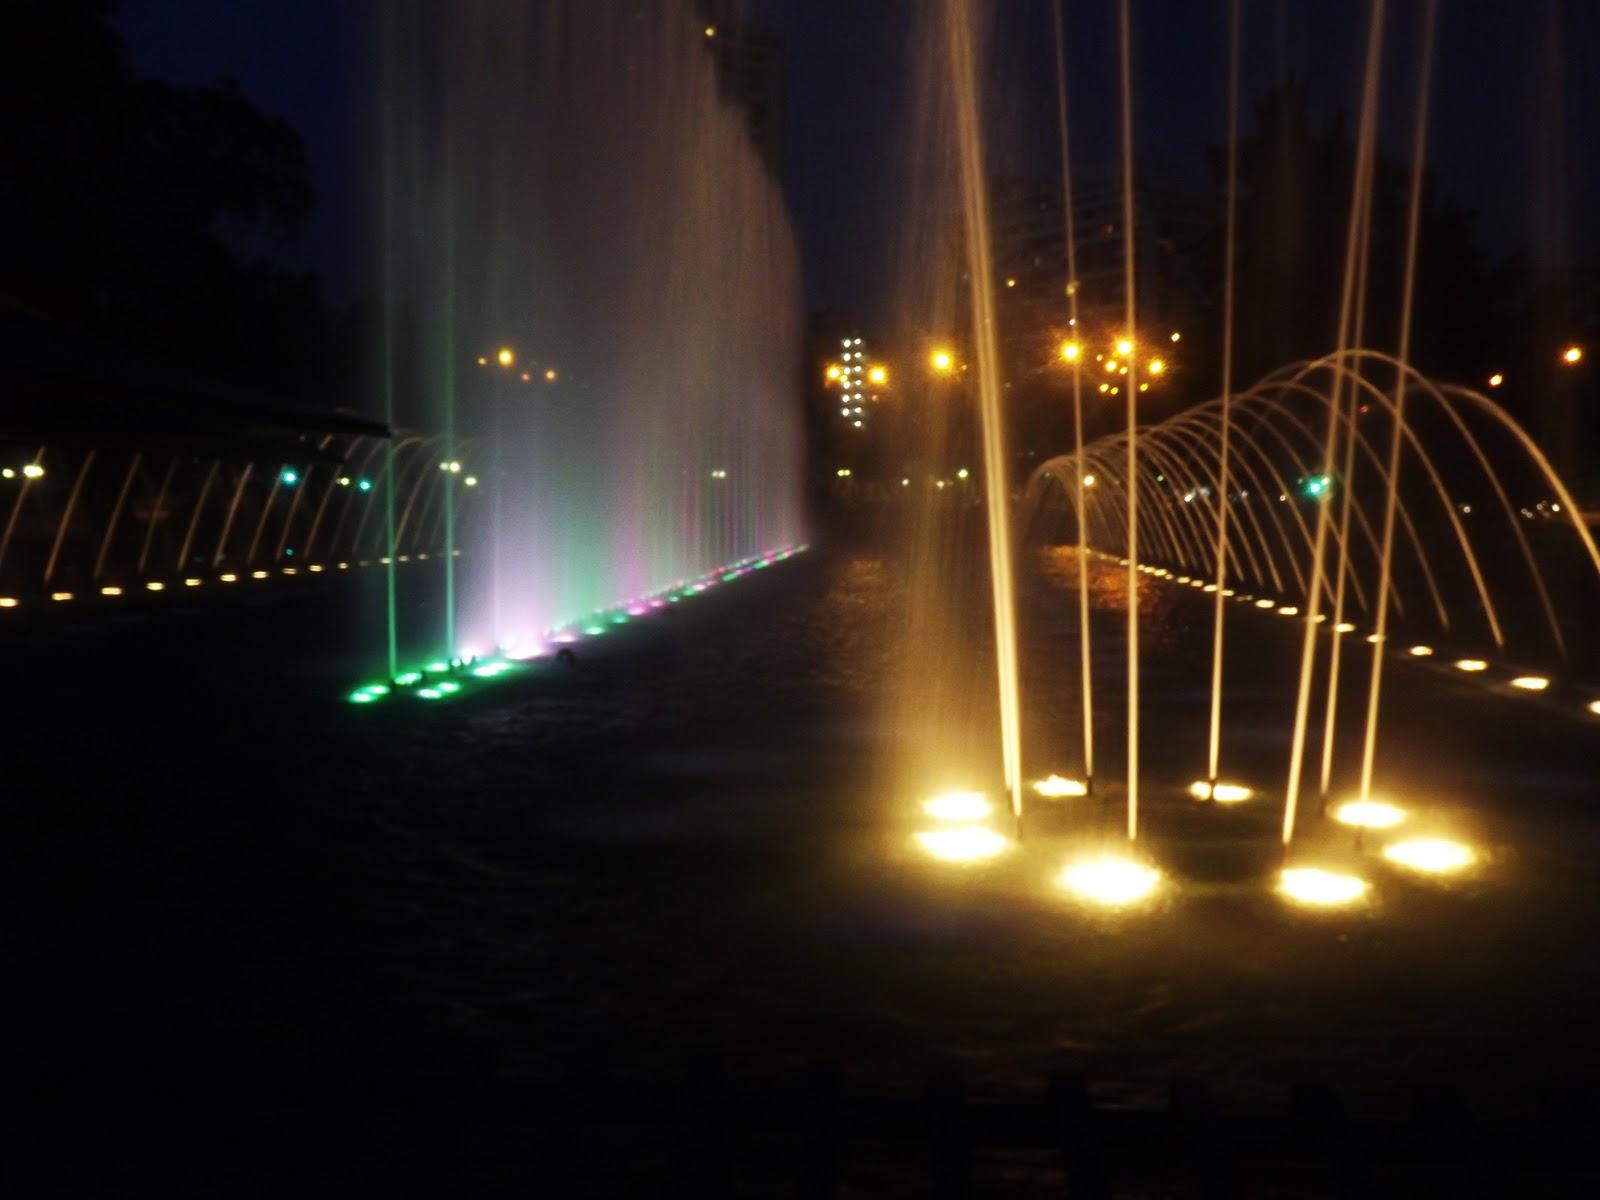 Luz camara accion 01 - 2 9